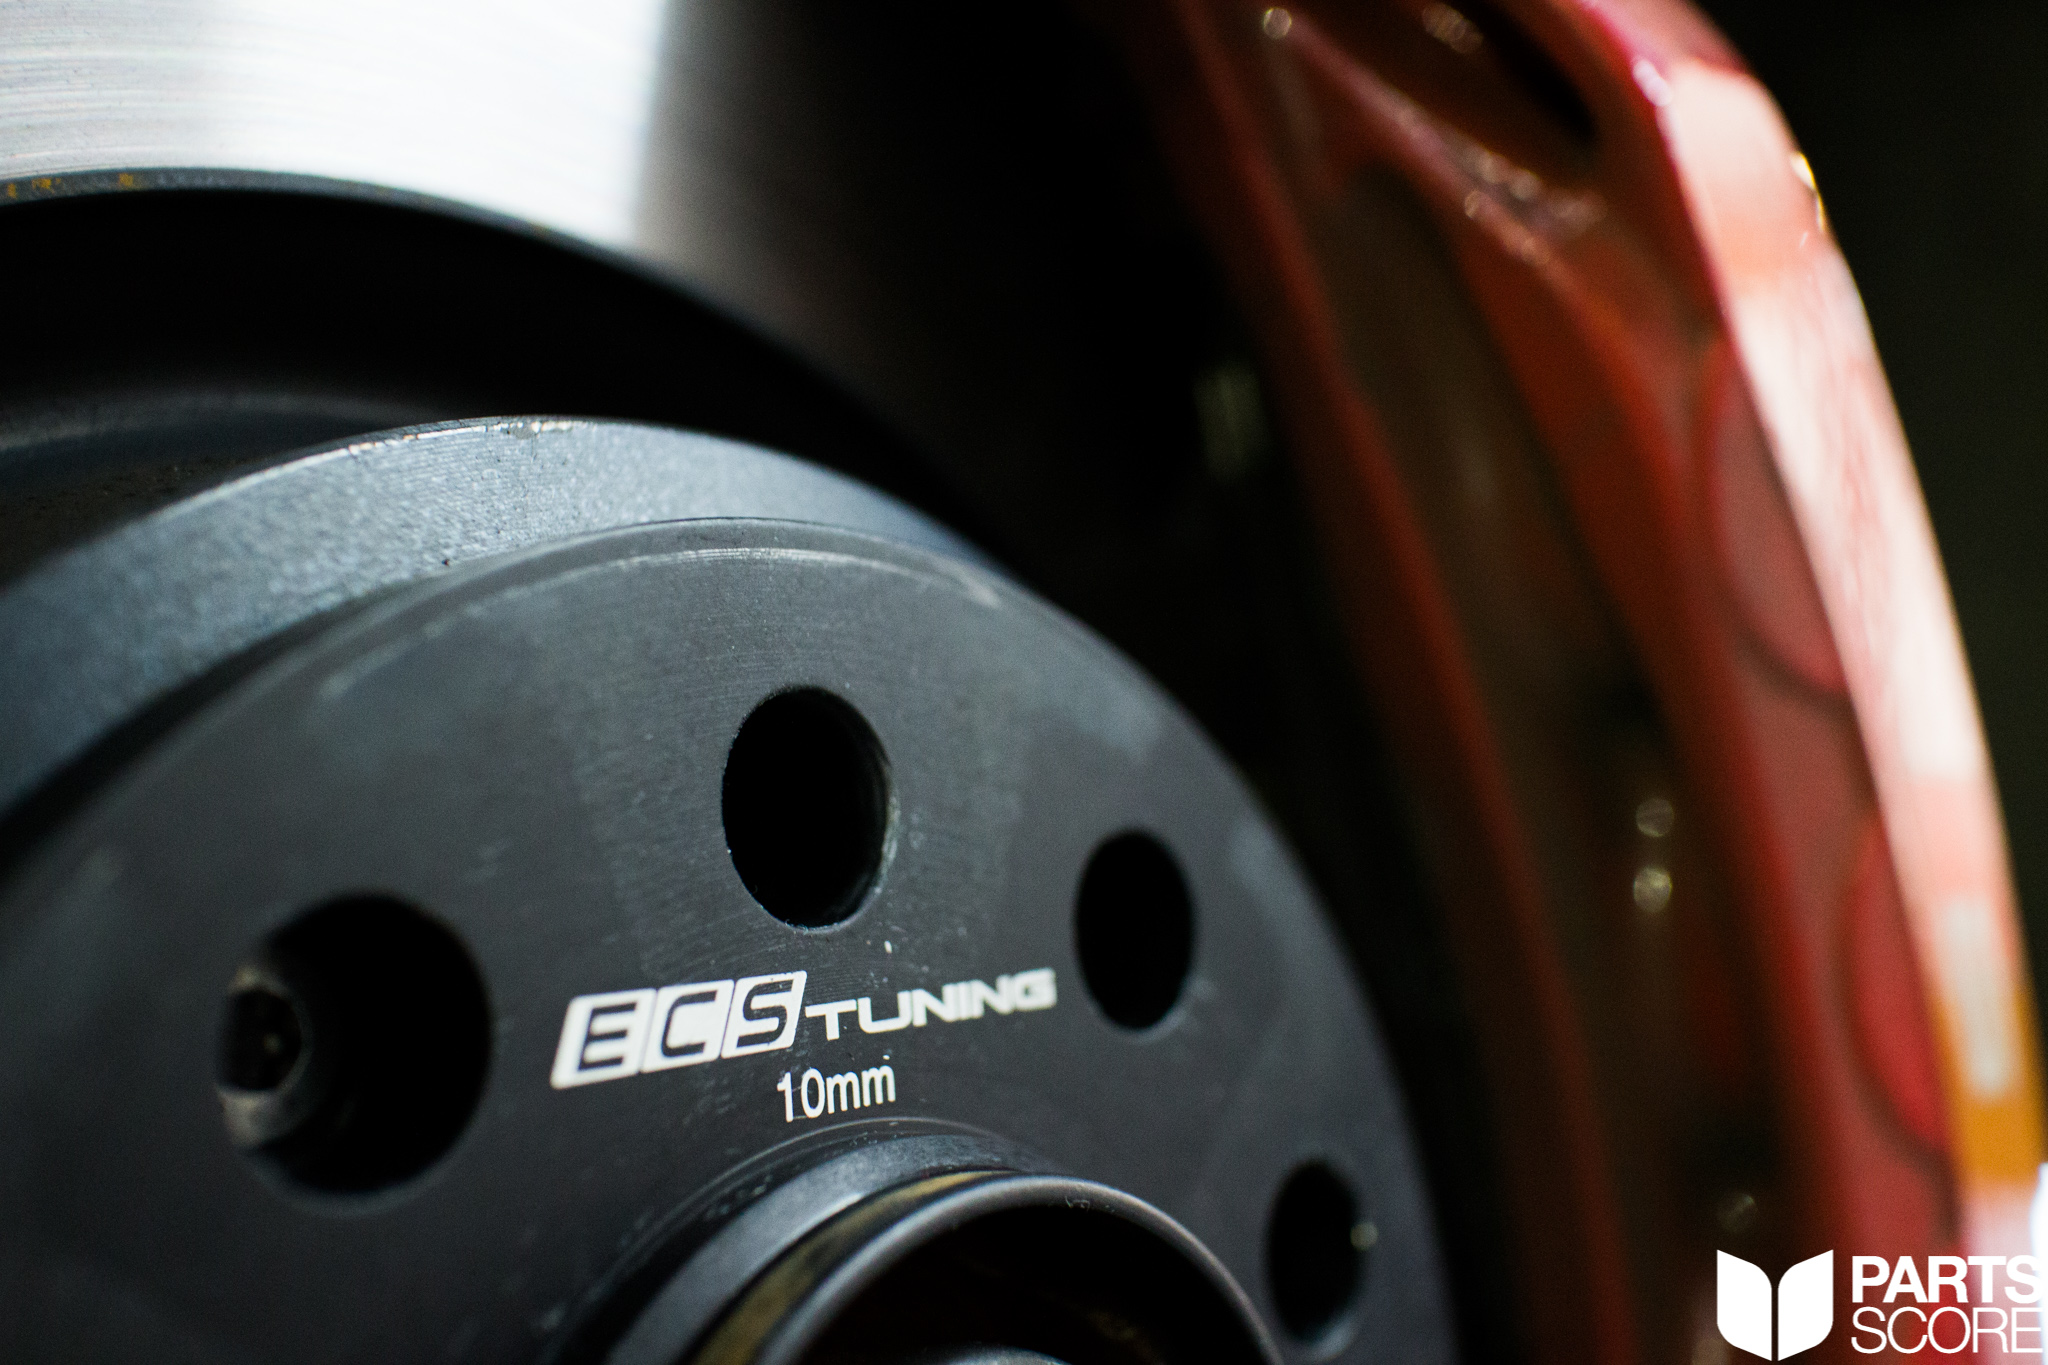 arizona, Audi, audi b9 s4, audi b9 s5, audi performance, audi s4, b9 audi mods, b9 h and r springs, b9 h r coilovers, b9 h&r springs, b9 modifications, b9 performance, b9 s4, b9 s4 034, b9 s4 034 motorsports, b9 s4 apr, b9 s4 awe tuning, b9 s4 carbon fiber, b9 s4 downpipe, b9 s4 exhaust, b9 s4 flash, b9 s4 flash tune, b9 s4 front lip, b9 s4 giac, b9 s4 giac tune, b9 s4 h and r coilovers, b9 s4 h r coilovers, b9 s4 h&r coilovers, b9 s4 h&r springs, b9 s4 intake, b9 s4 kw coilovers, b9 s4 kwv1, b9 s4 kwv2, b9 s4 kwv3, b9 s4 lip, b9 s4 milltek, b9 s4 modification, b9 s4 mods, b9 s4 navigation, b9 s4 ohlins, b9 s4 ohlins road and track, b9 s4 painted reflectors, b9 s4 performance, b9 s4 performance mods, b9 s4 power, b9 s4 spacers, b9 s4 spoiler, b9 s4 springs, b9 s4 tune, b9 s5, b9 s5 apr, b9 s5 awe tuning, b9 s5 carbon fiber, b9 s5 downpipe, b9 s5 exhaust, b9 s5 front lip, b9 s5 giac, b9 s5 h&r springs, b9 s5 intake, b9 s5 milltek, b9 s5 mods, b9 s5 painted reflectors, b9 s5 performance, b9 s5 power, b9 s5 springs, giac flash, giac tune, giactuned, glacier white, h and r coilovers b9, kw coilovers b9, magma red, parts score, s4 b9 cts turbo, scottsdale